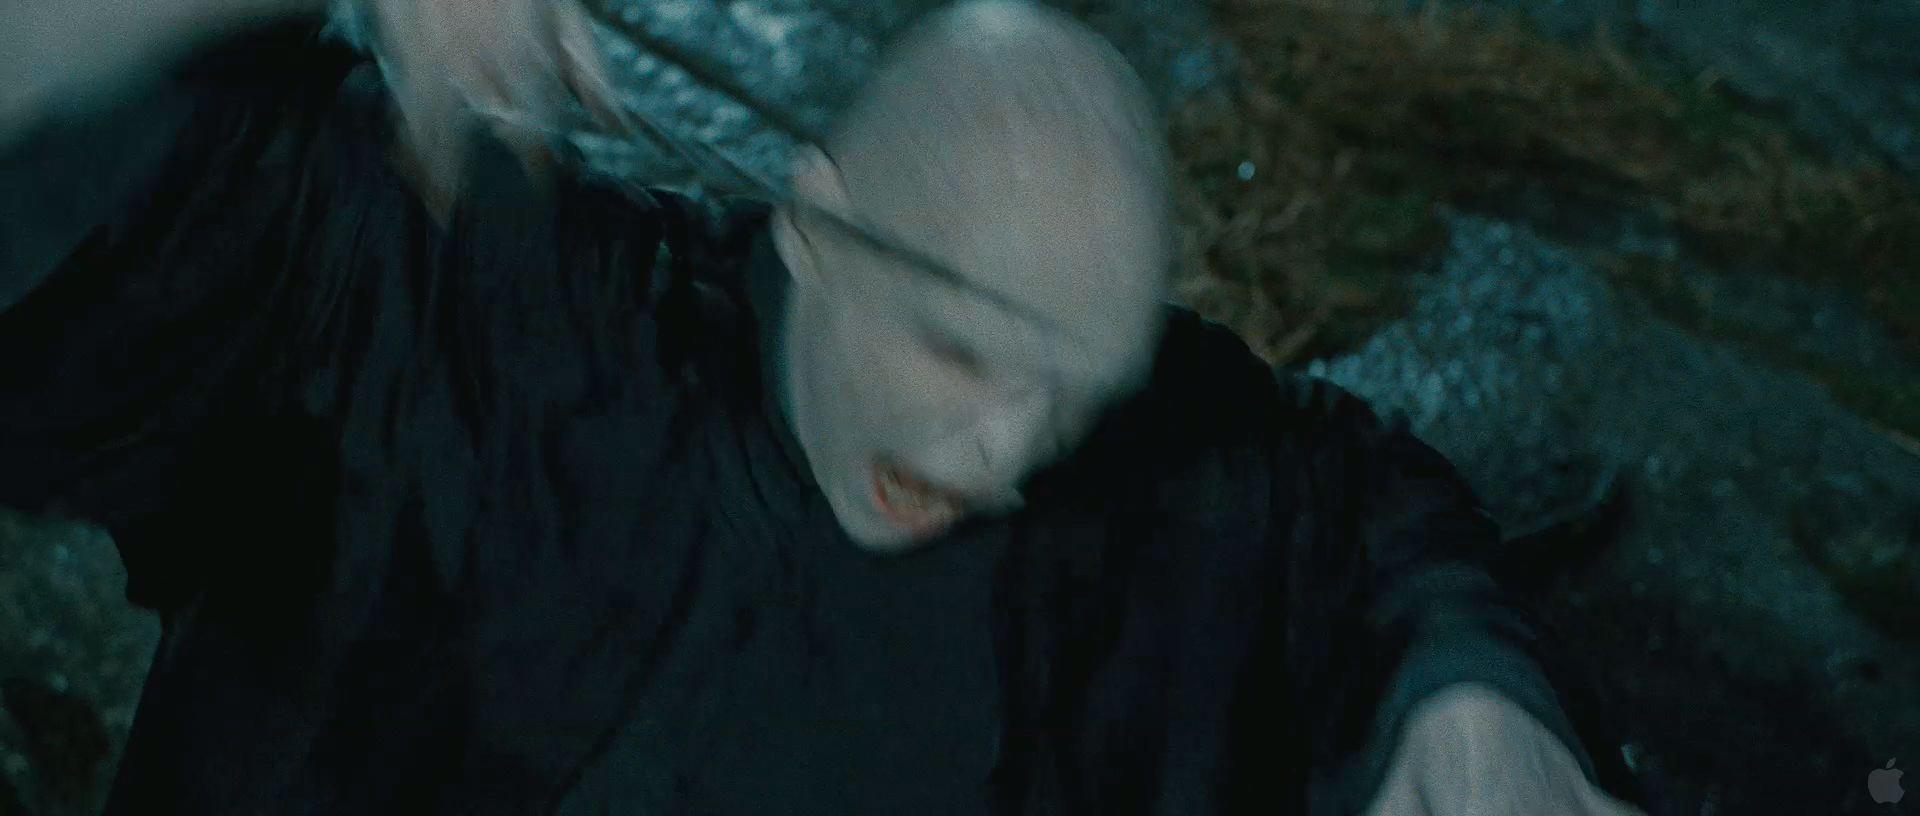 Harry Potter BlogHogwarts HP7 2 Trailer 52